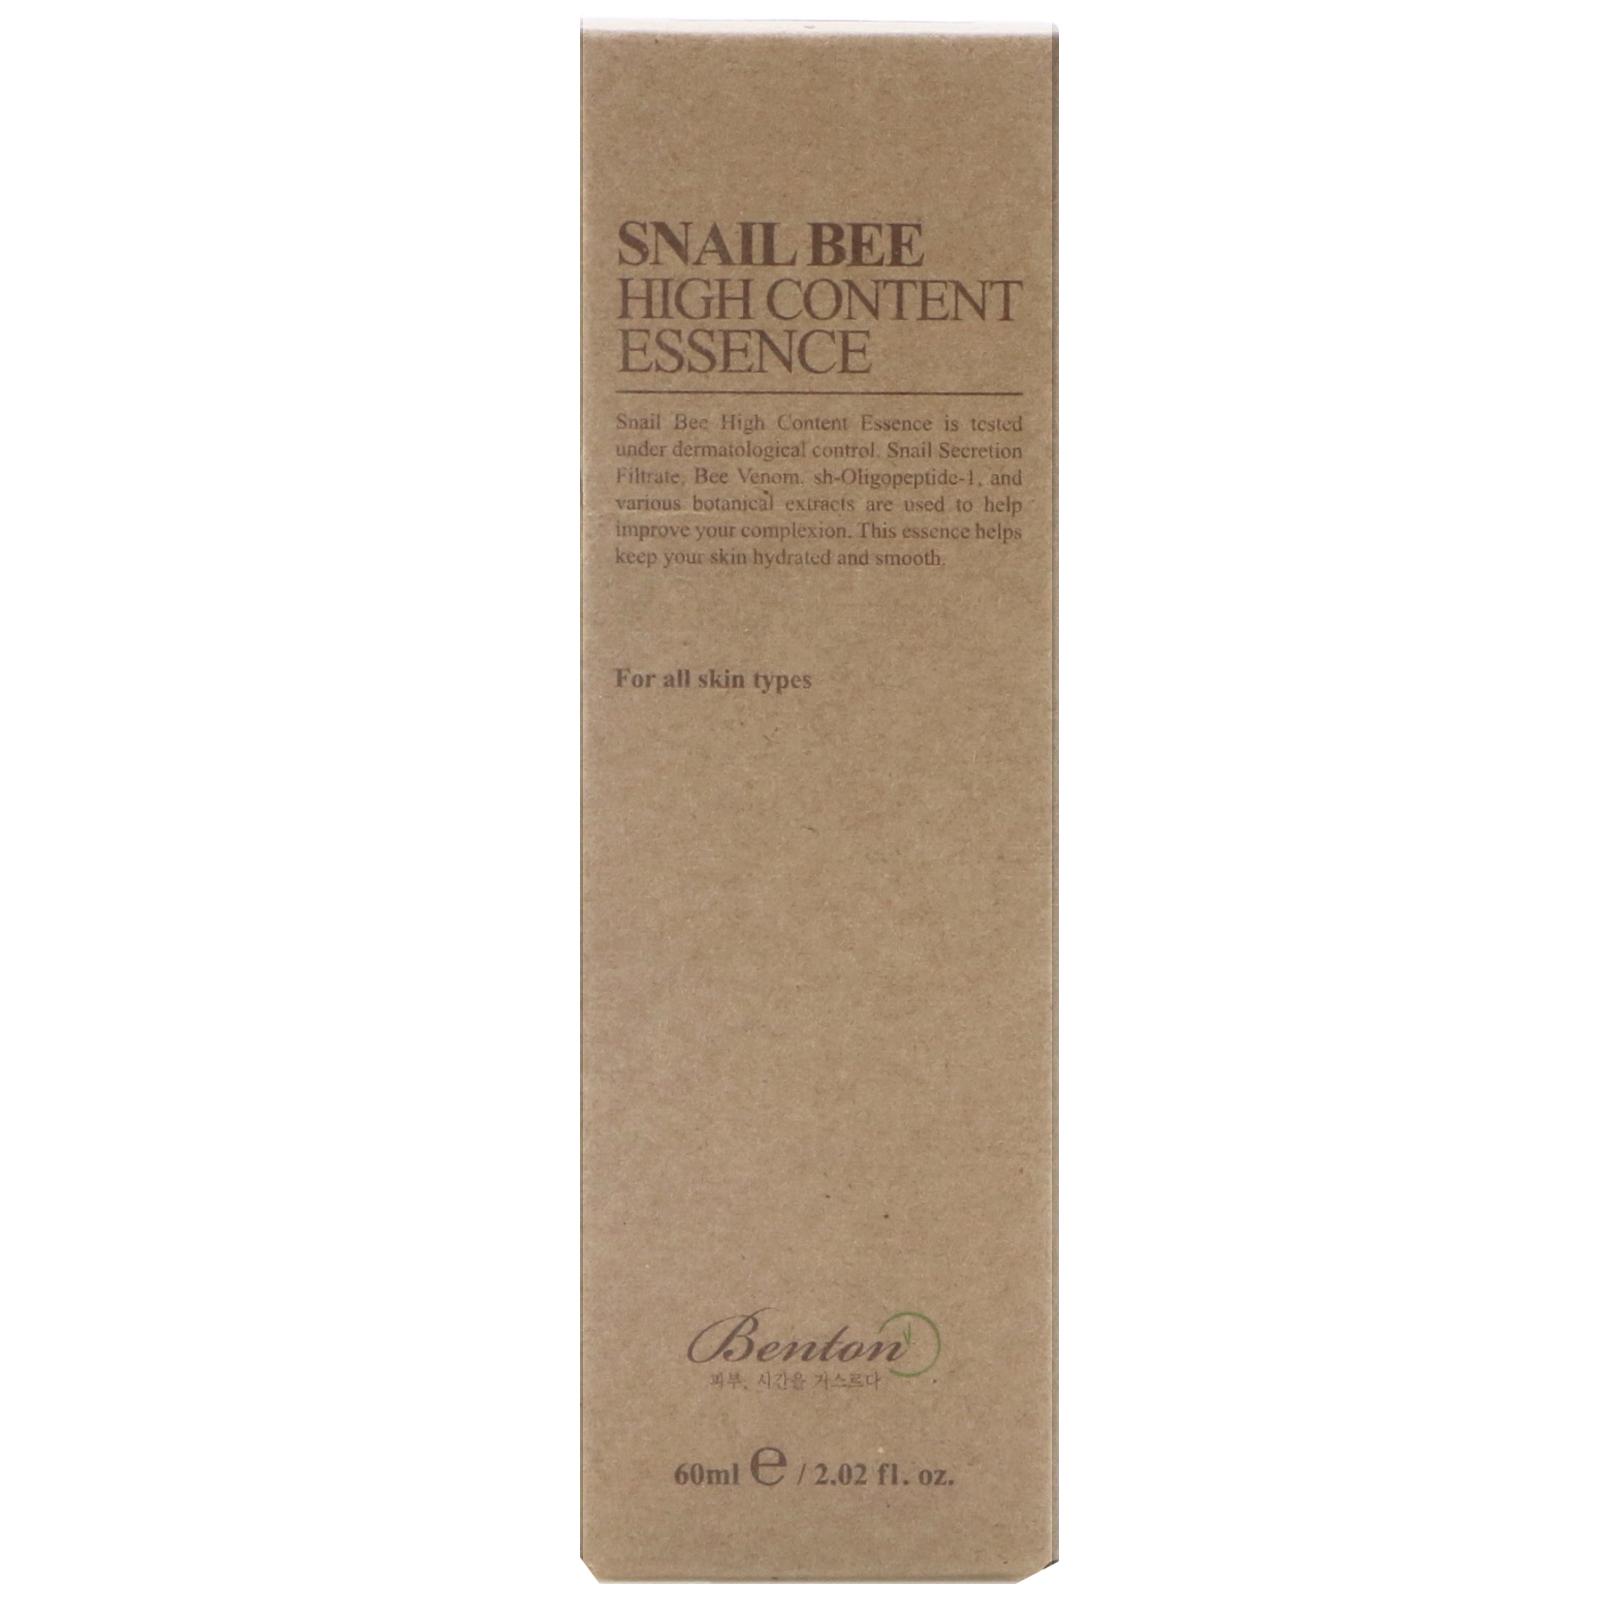 Benton Snail Bee High Content Essence 202 Fl Oz 60 Ml Secretion Filtrate Moisture Facial Cream 30